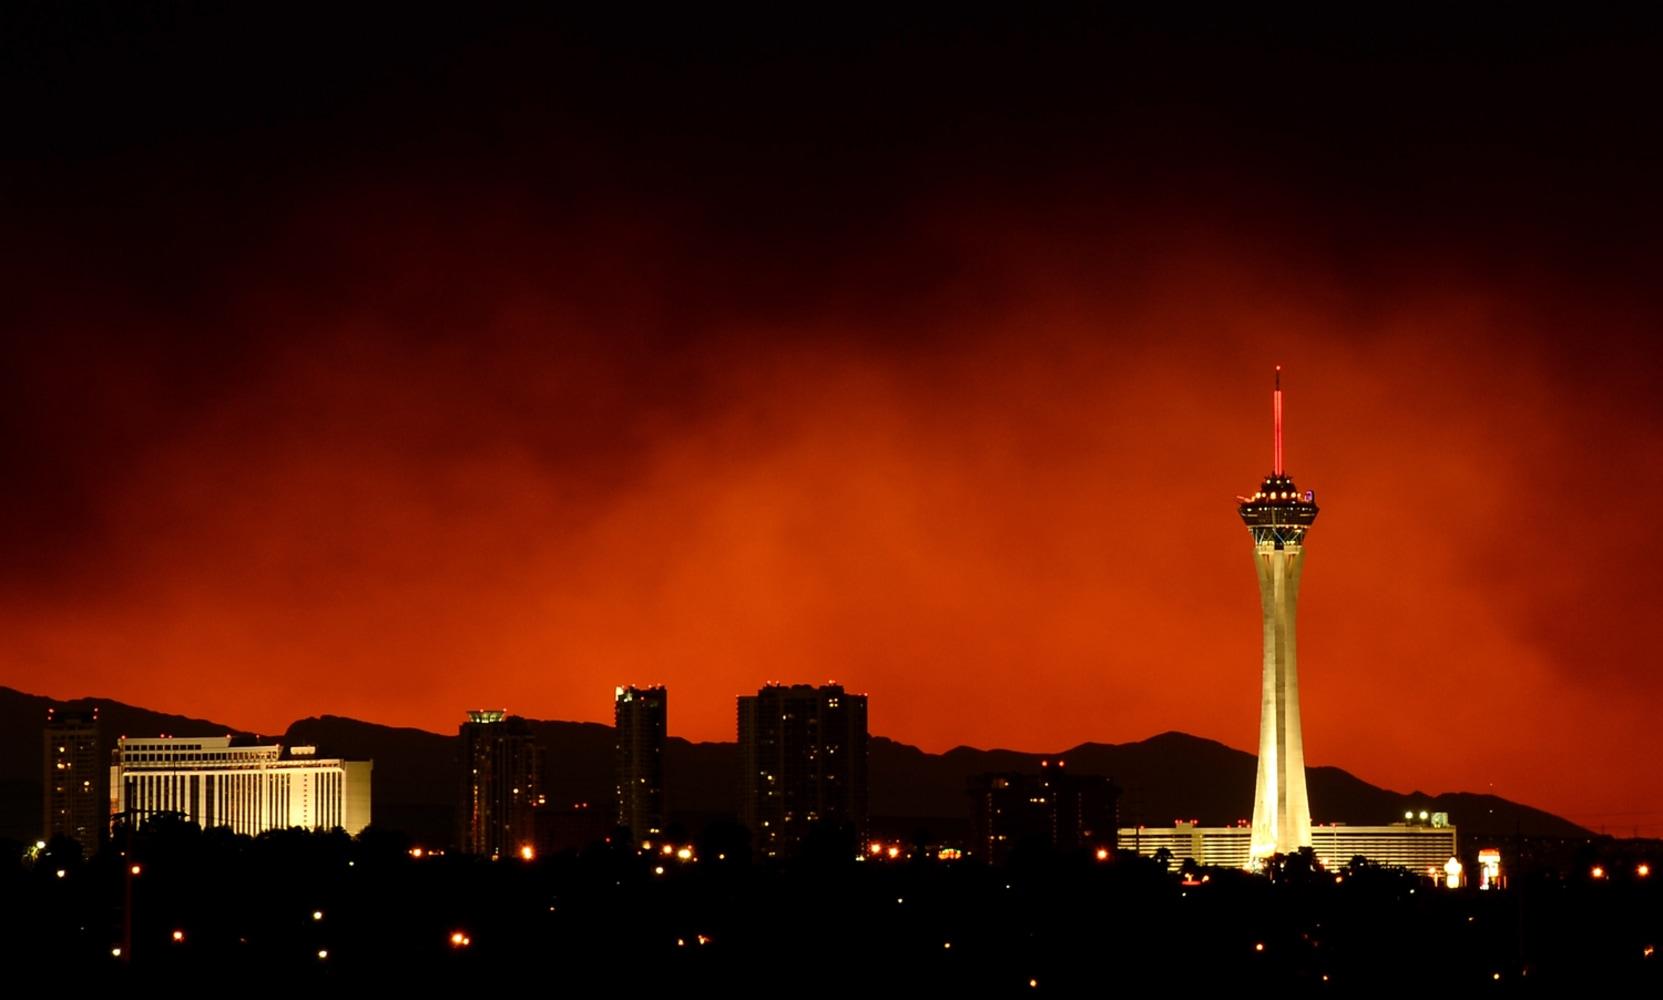 Smoke from massive wildfire billows over Las Vegas - NBC News